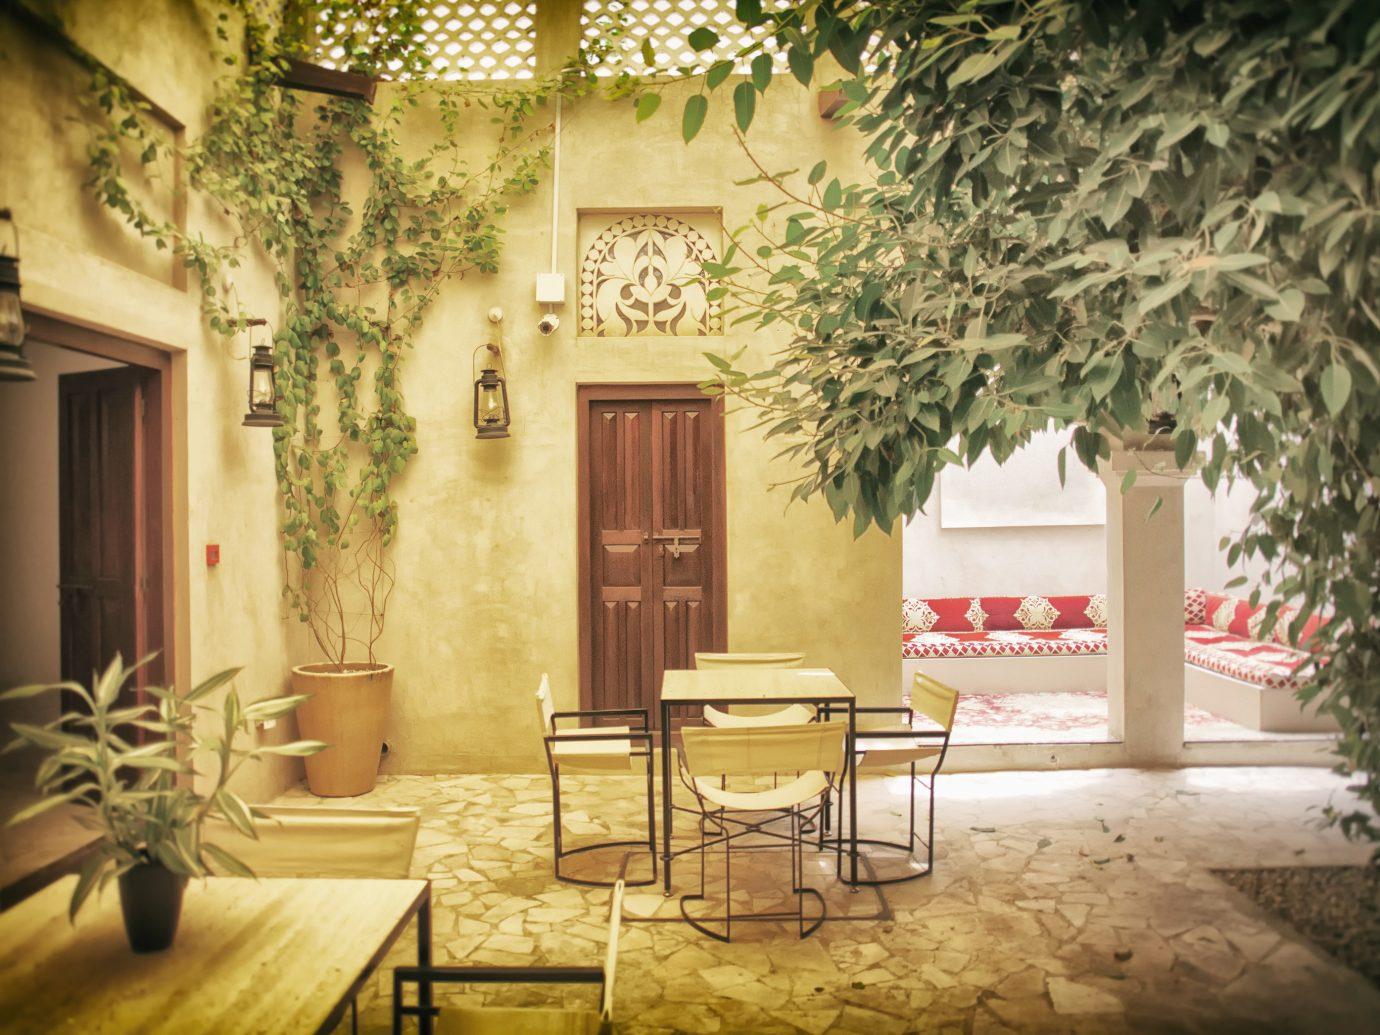 Dubai Hotels Luxury Travel Middle East interior design home Courtyard Lobby window tree estate hacienda house